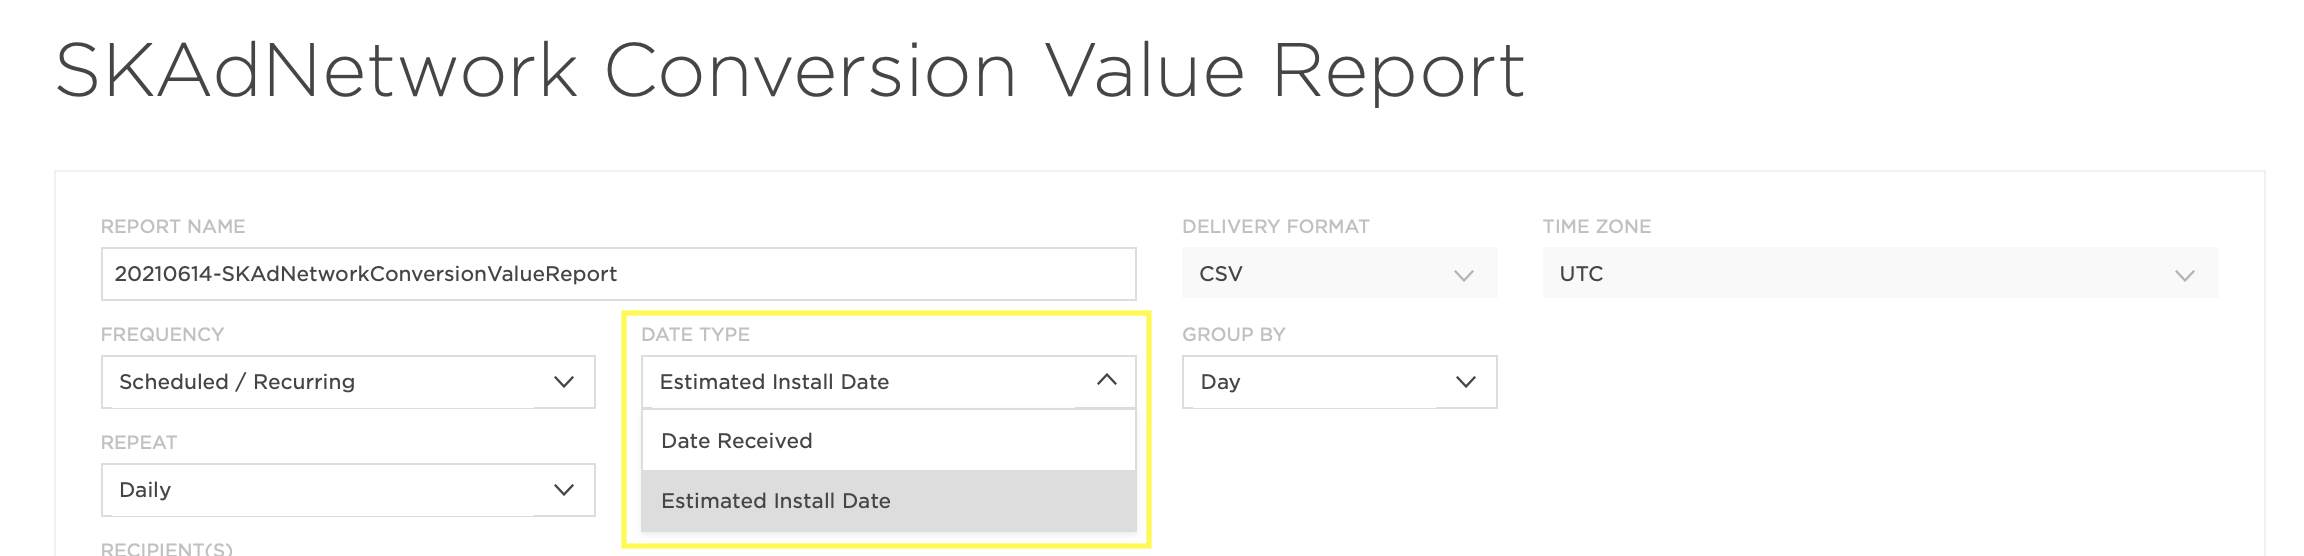 Kochava SKAdNetwork conversion value report